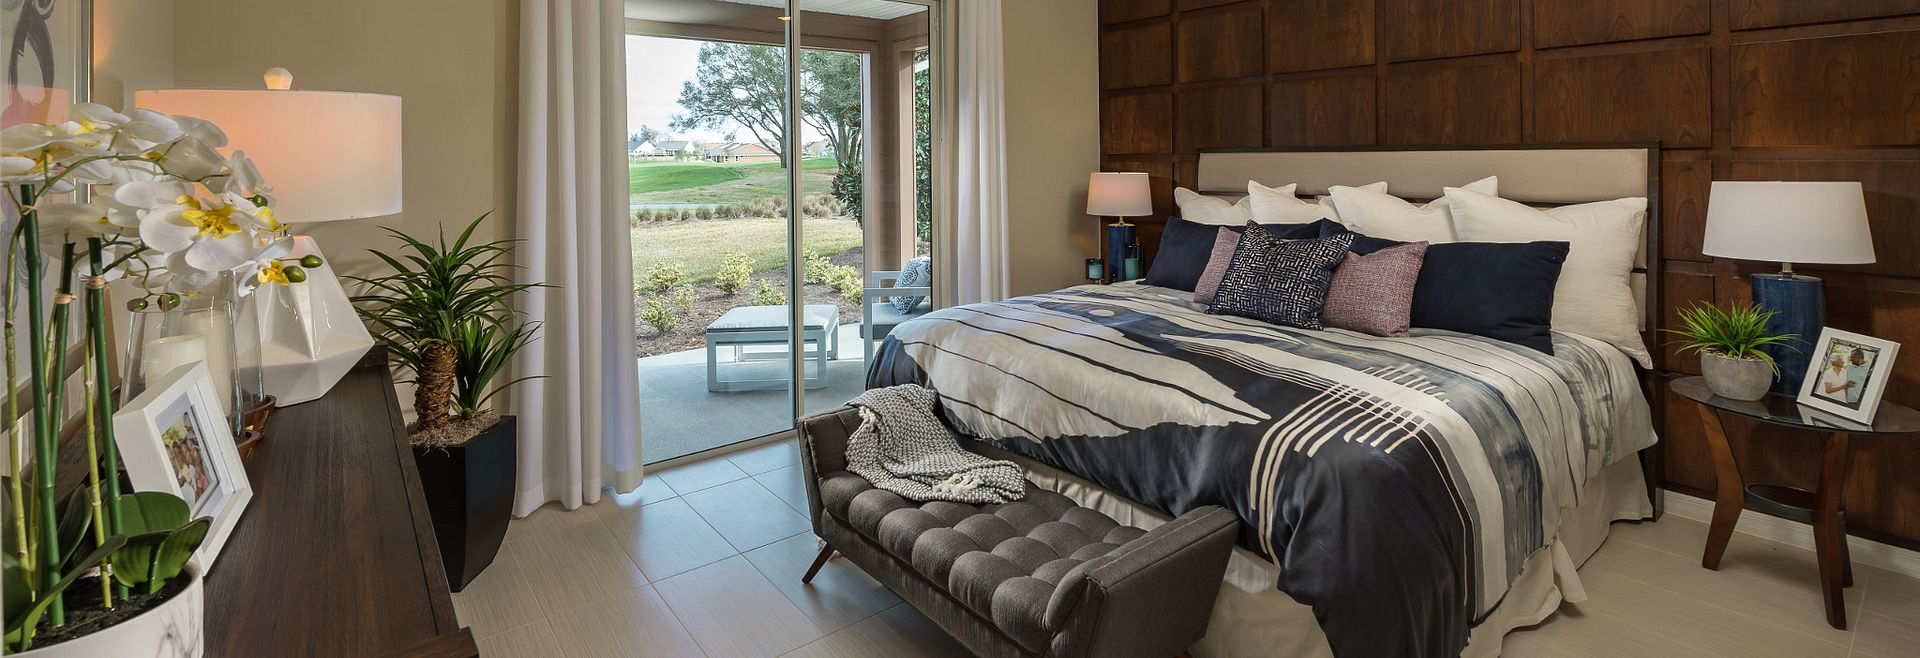 Rome Plan Master Bedroom